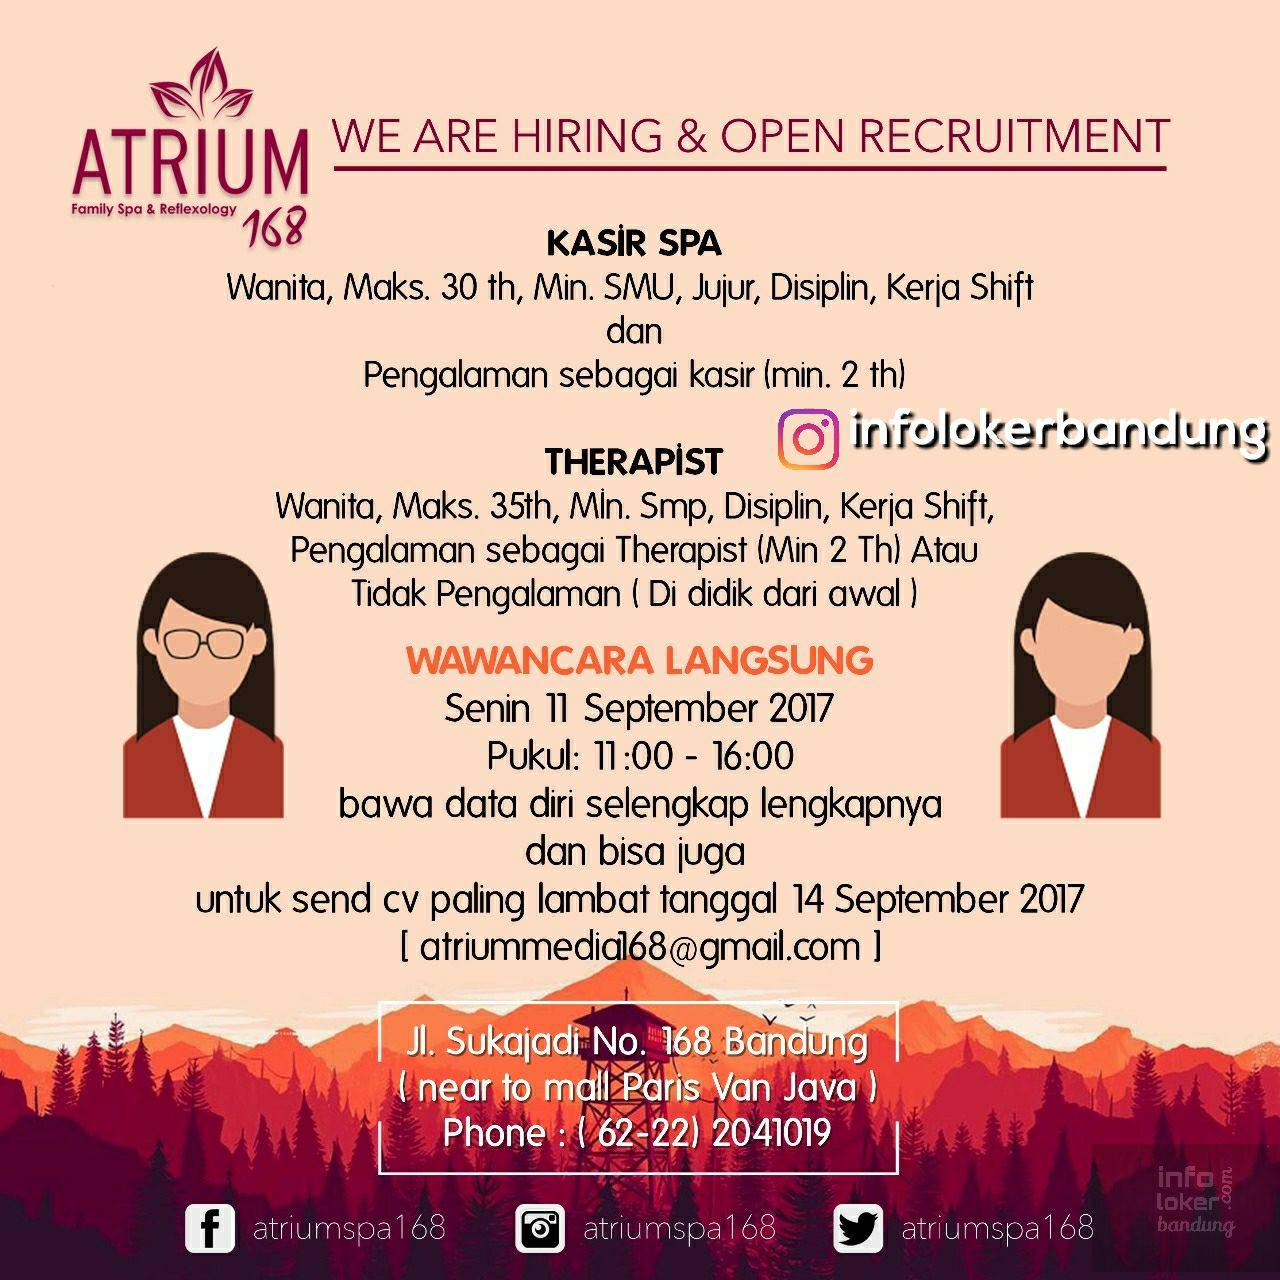 Lowongan Kerja Atrium 168 Bandung ( Walk In Interview ) September 2017